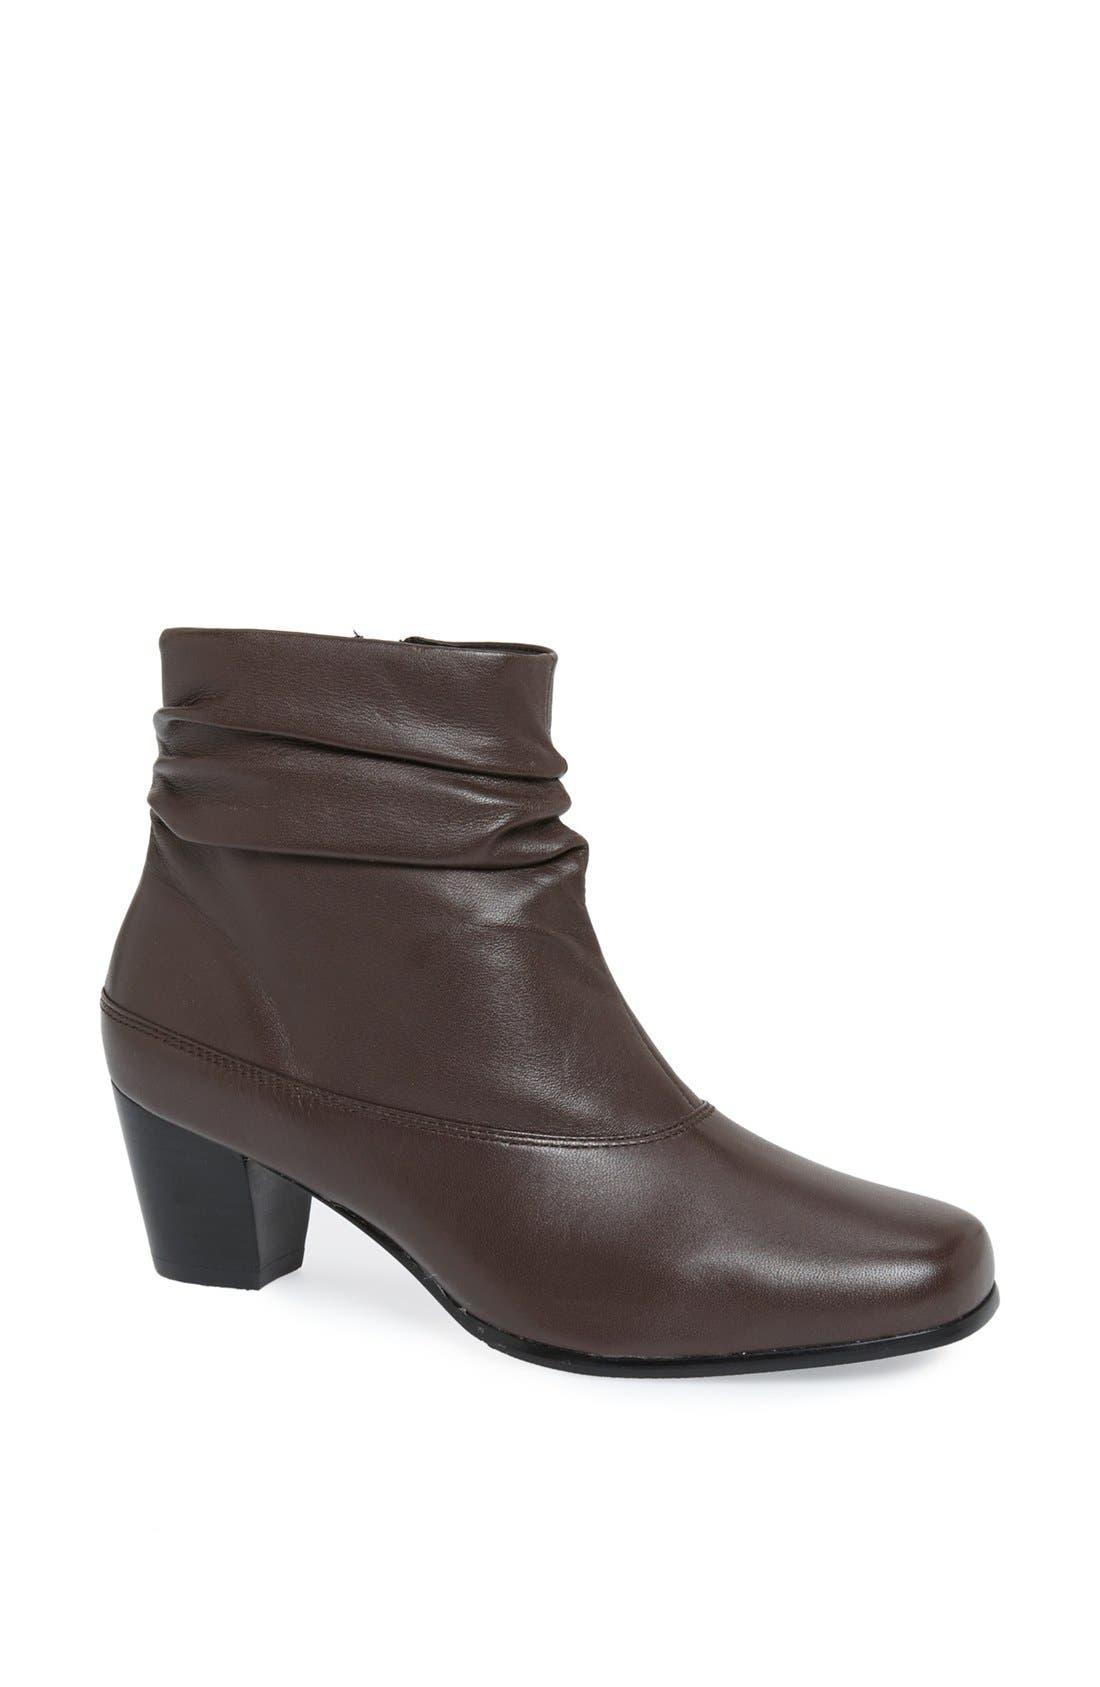 David Tate 'Vera' Boot